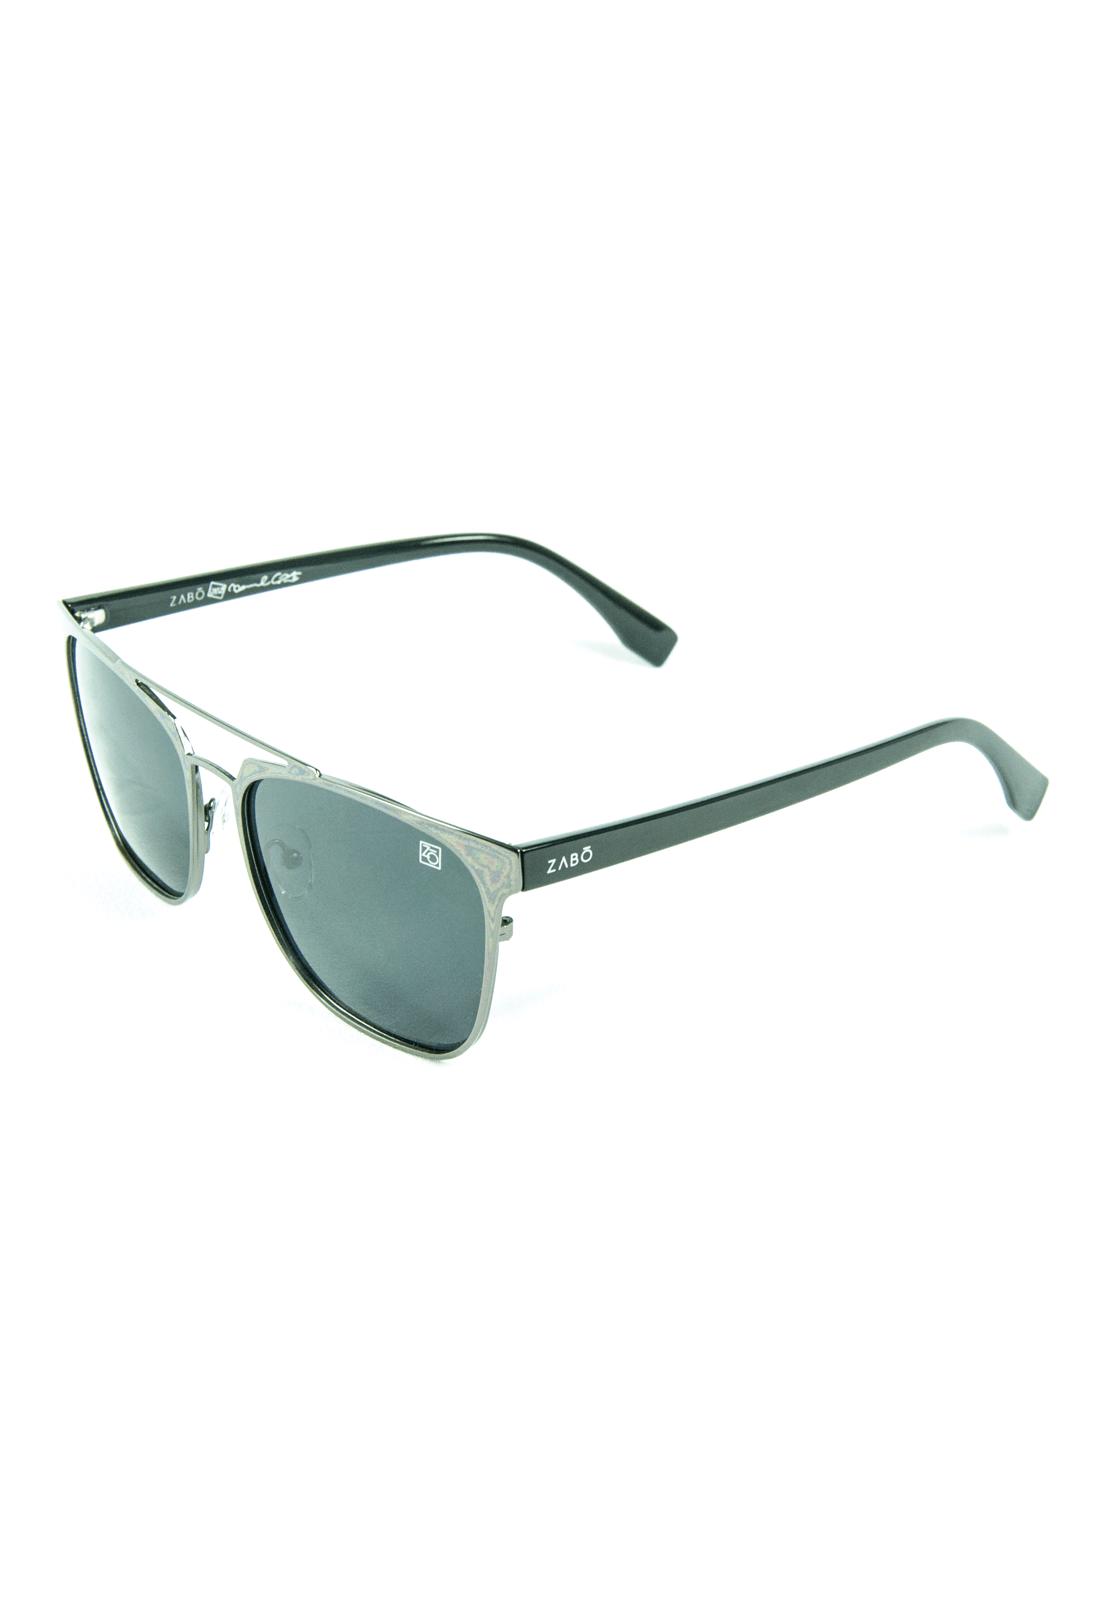 Óculos de Sol Polarizado Zabô Pro Model Crazy Series II Prata